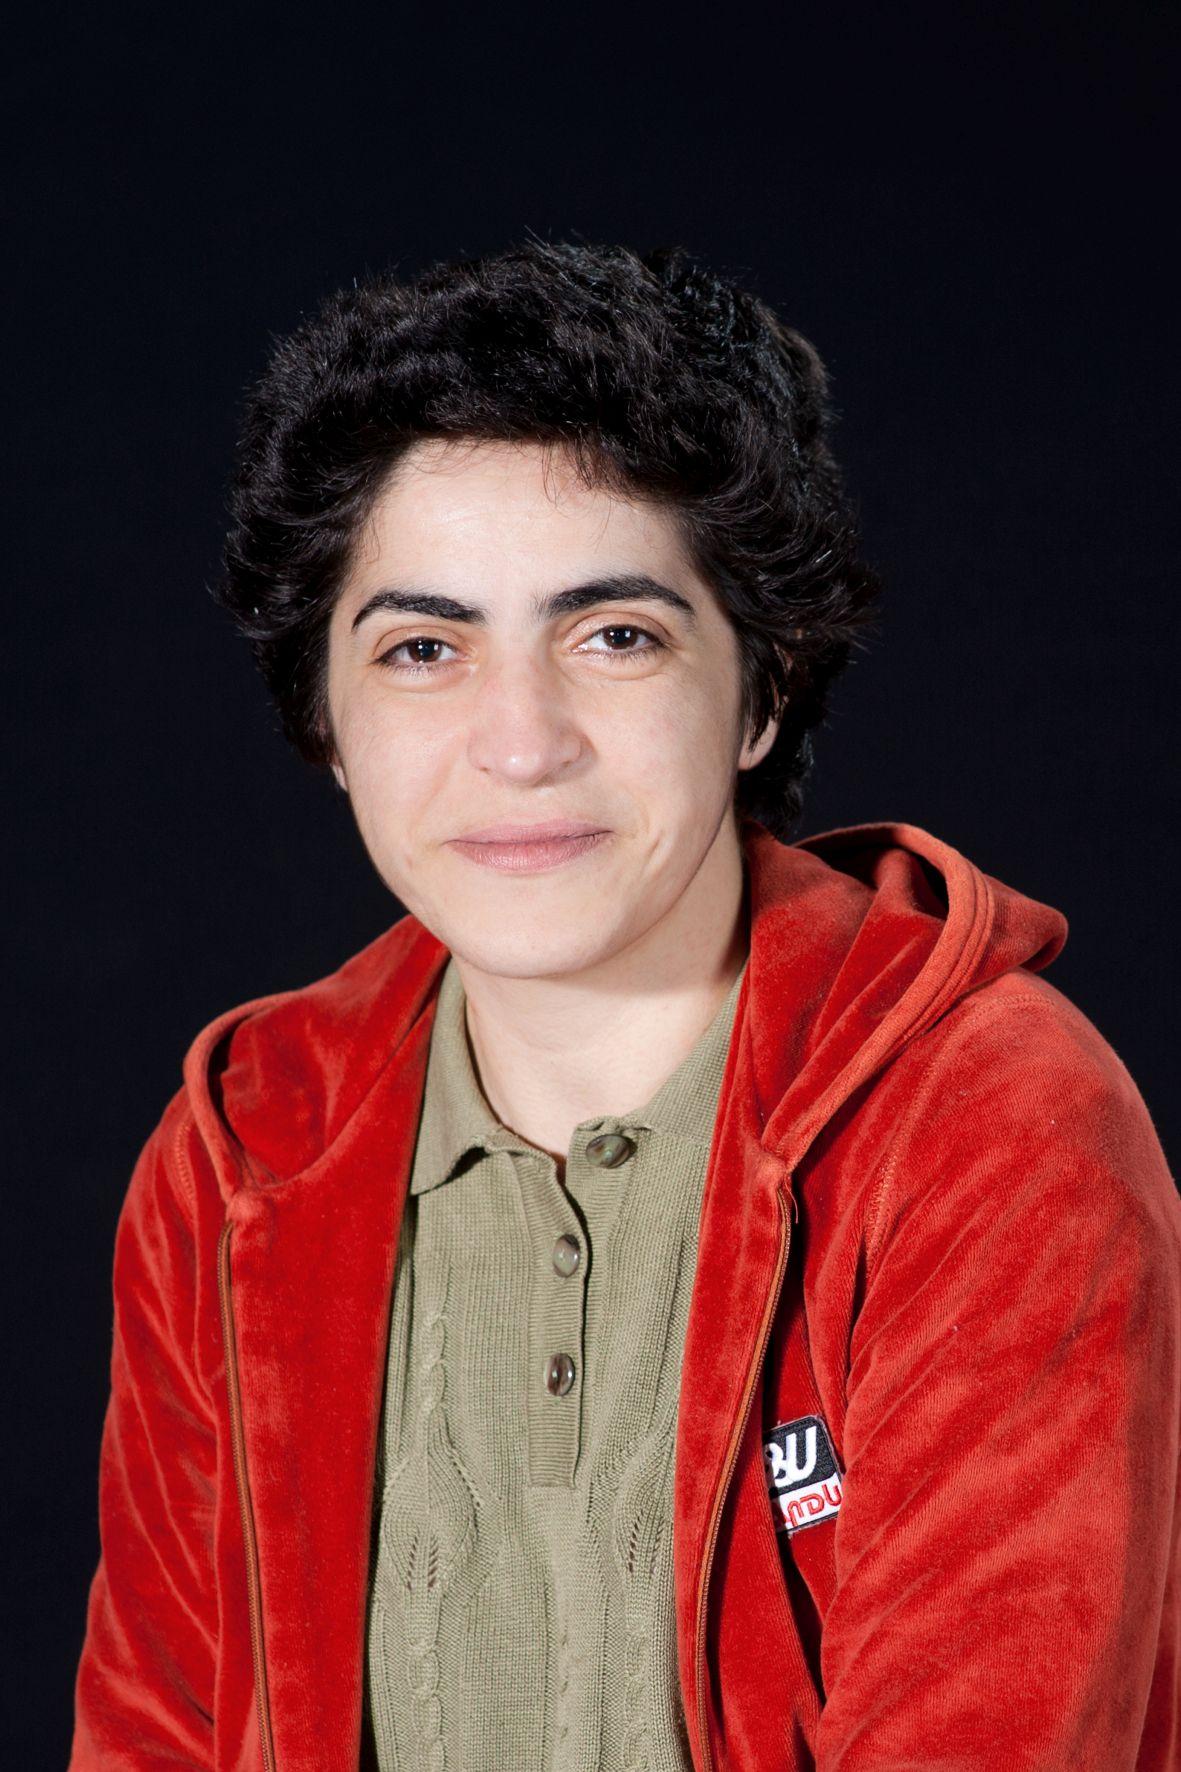 Andrea Tokai